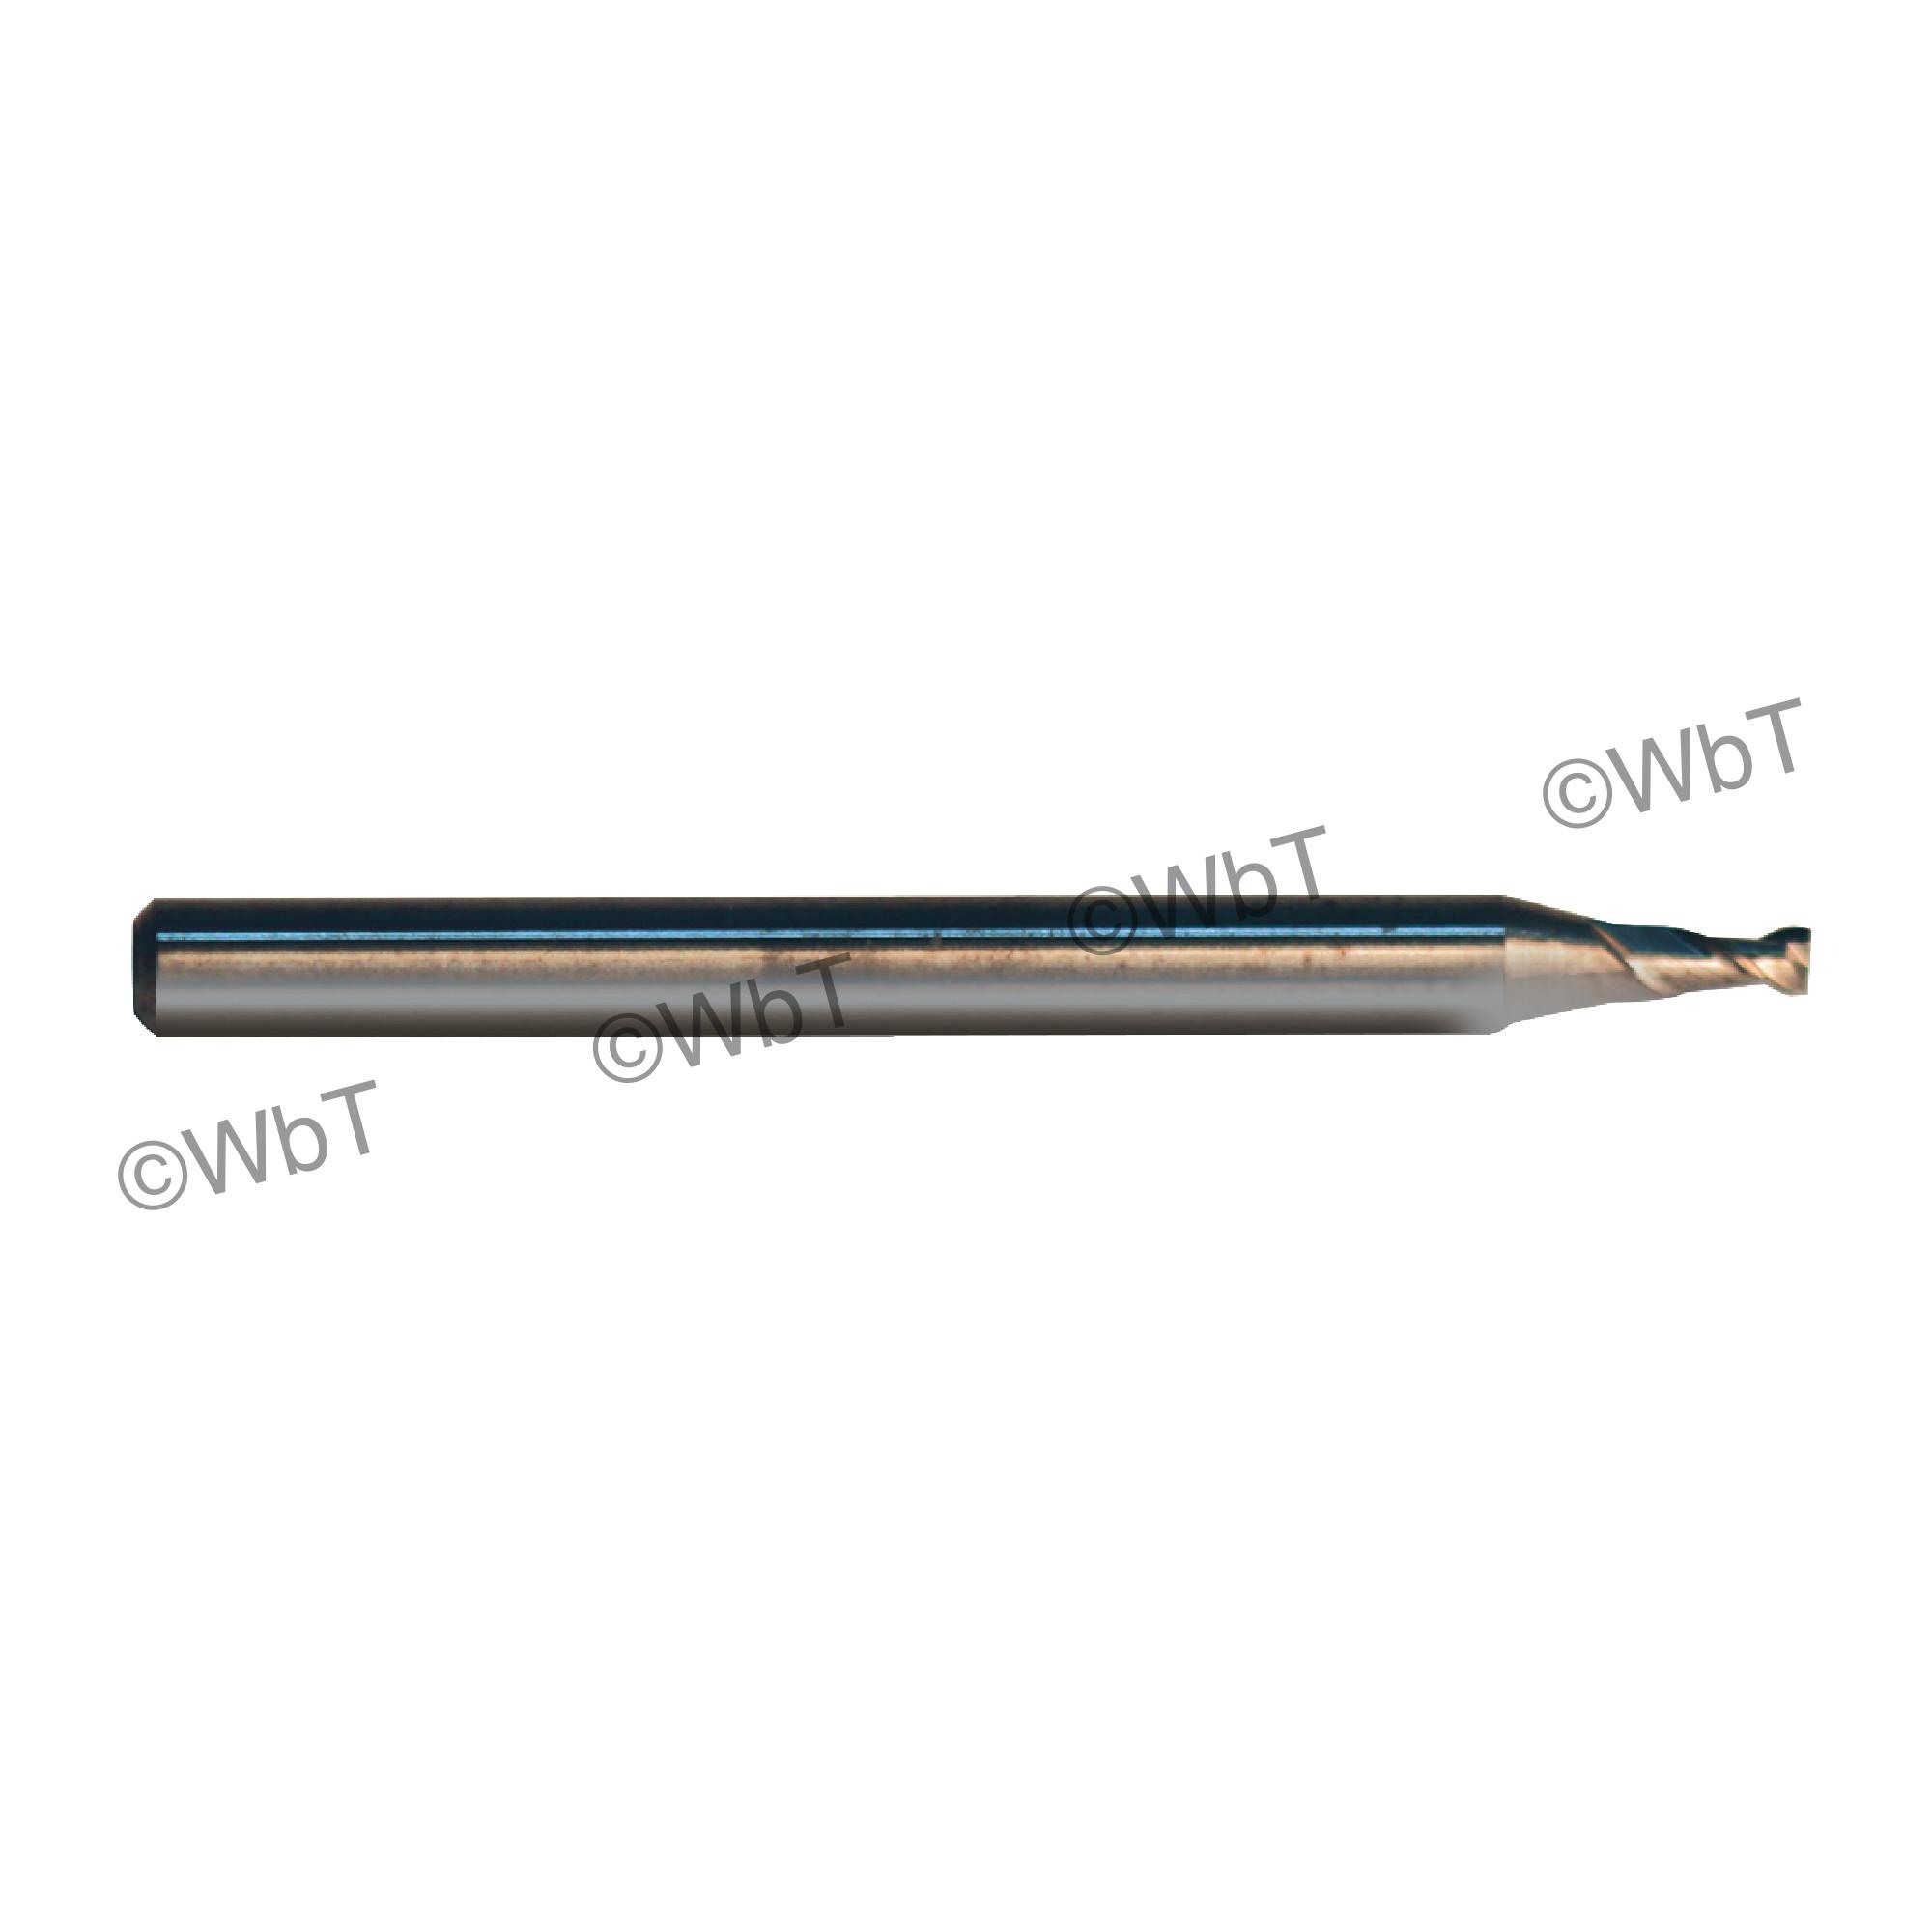 "1/16"" Solid Carbide 10% Cobalt 40° 2 Flute Center Cutting Stub Length Single End Mill"